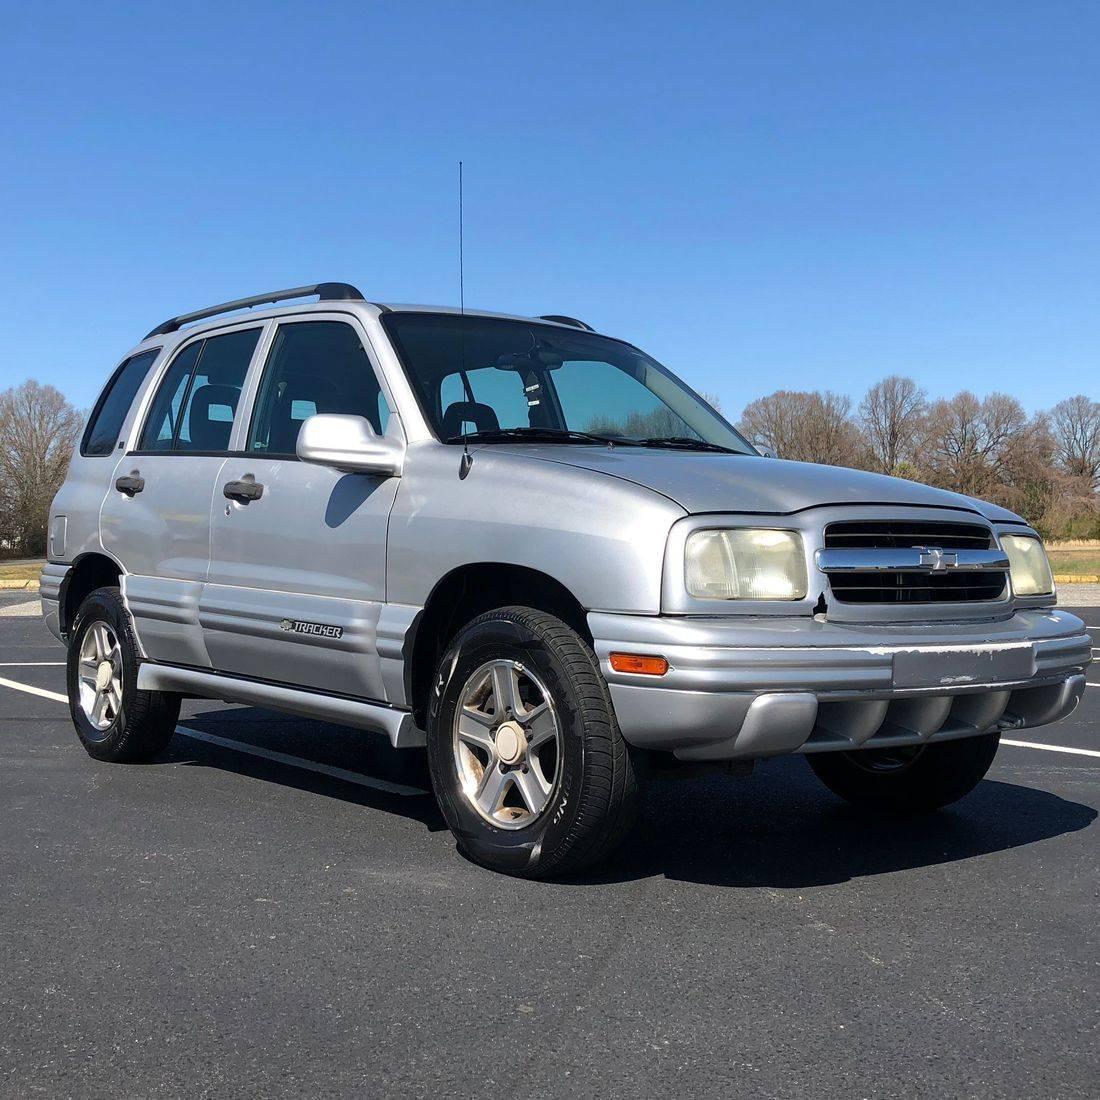 2004 Chevy Tracker 4x4